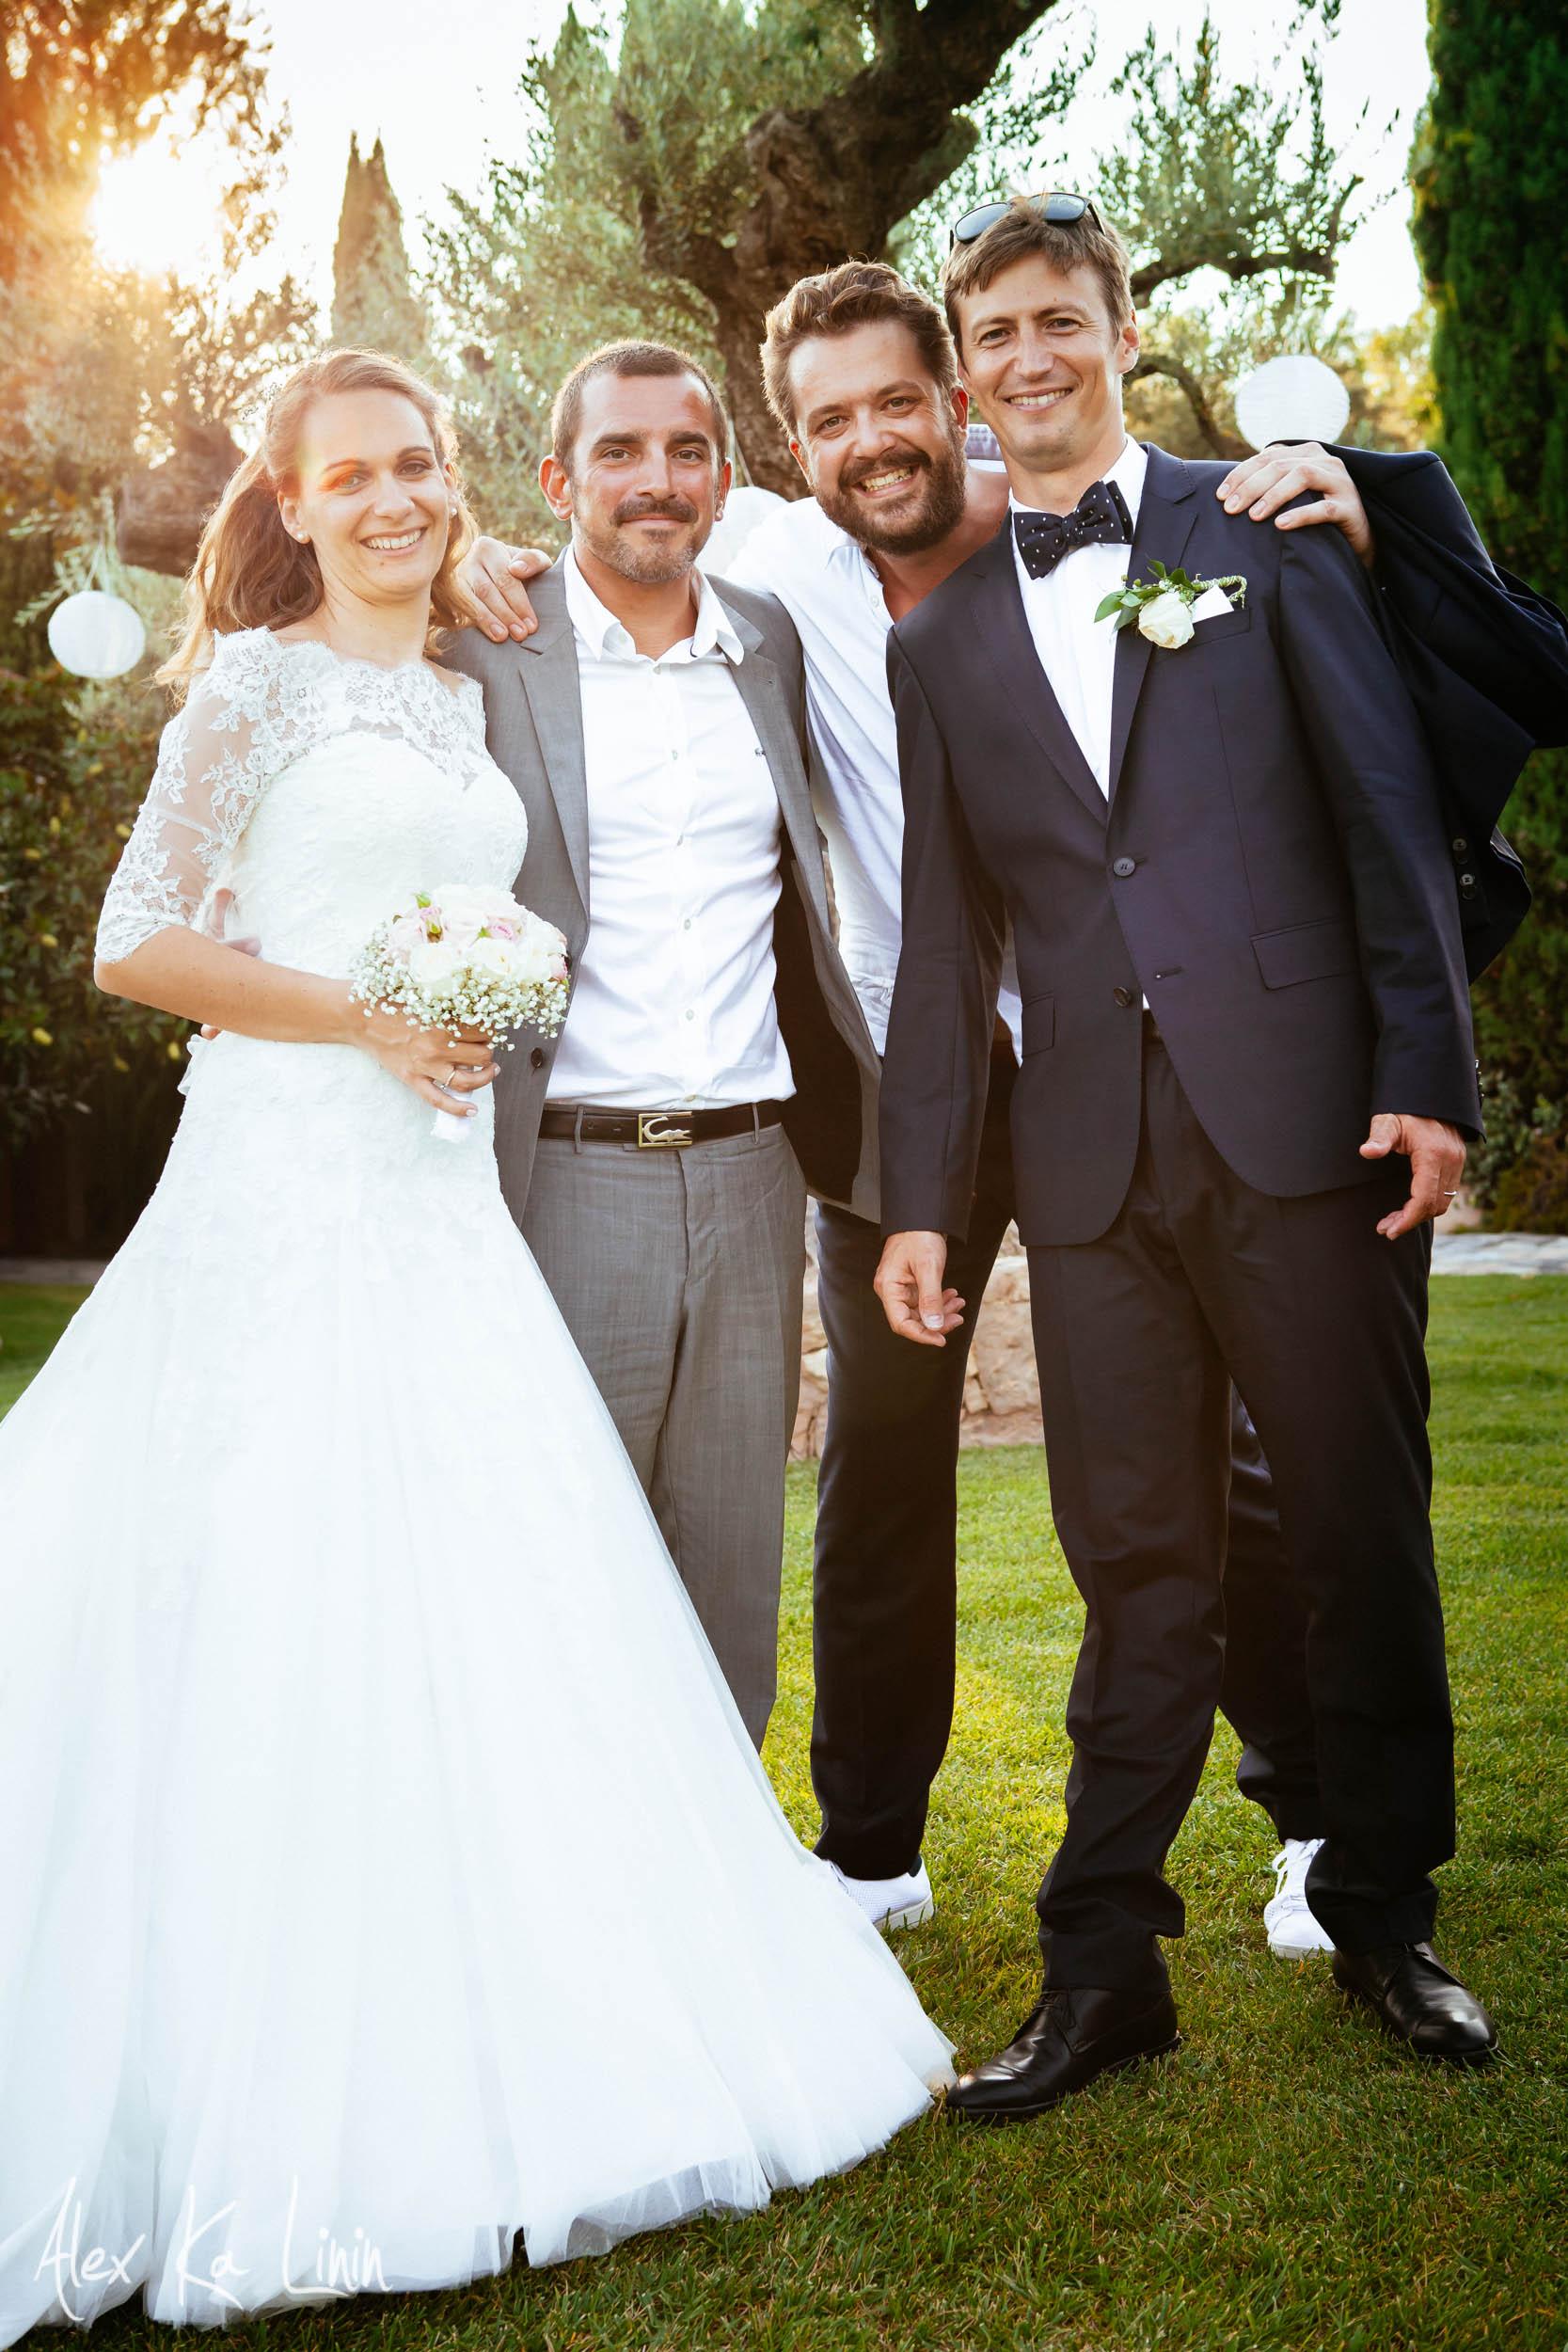 AlexKa_wedding_mariage_photographer-44.jpg